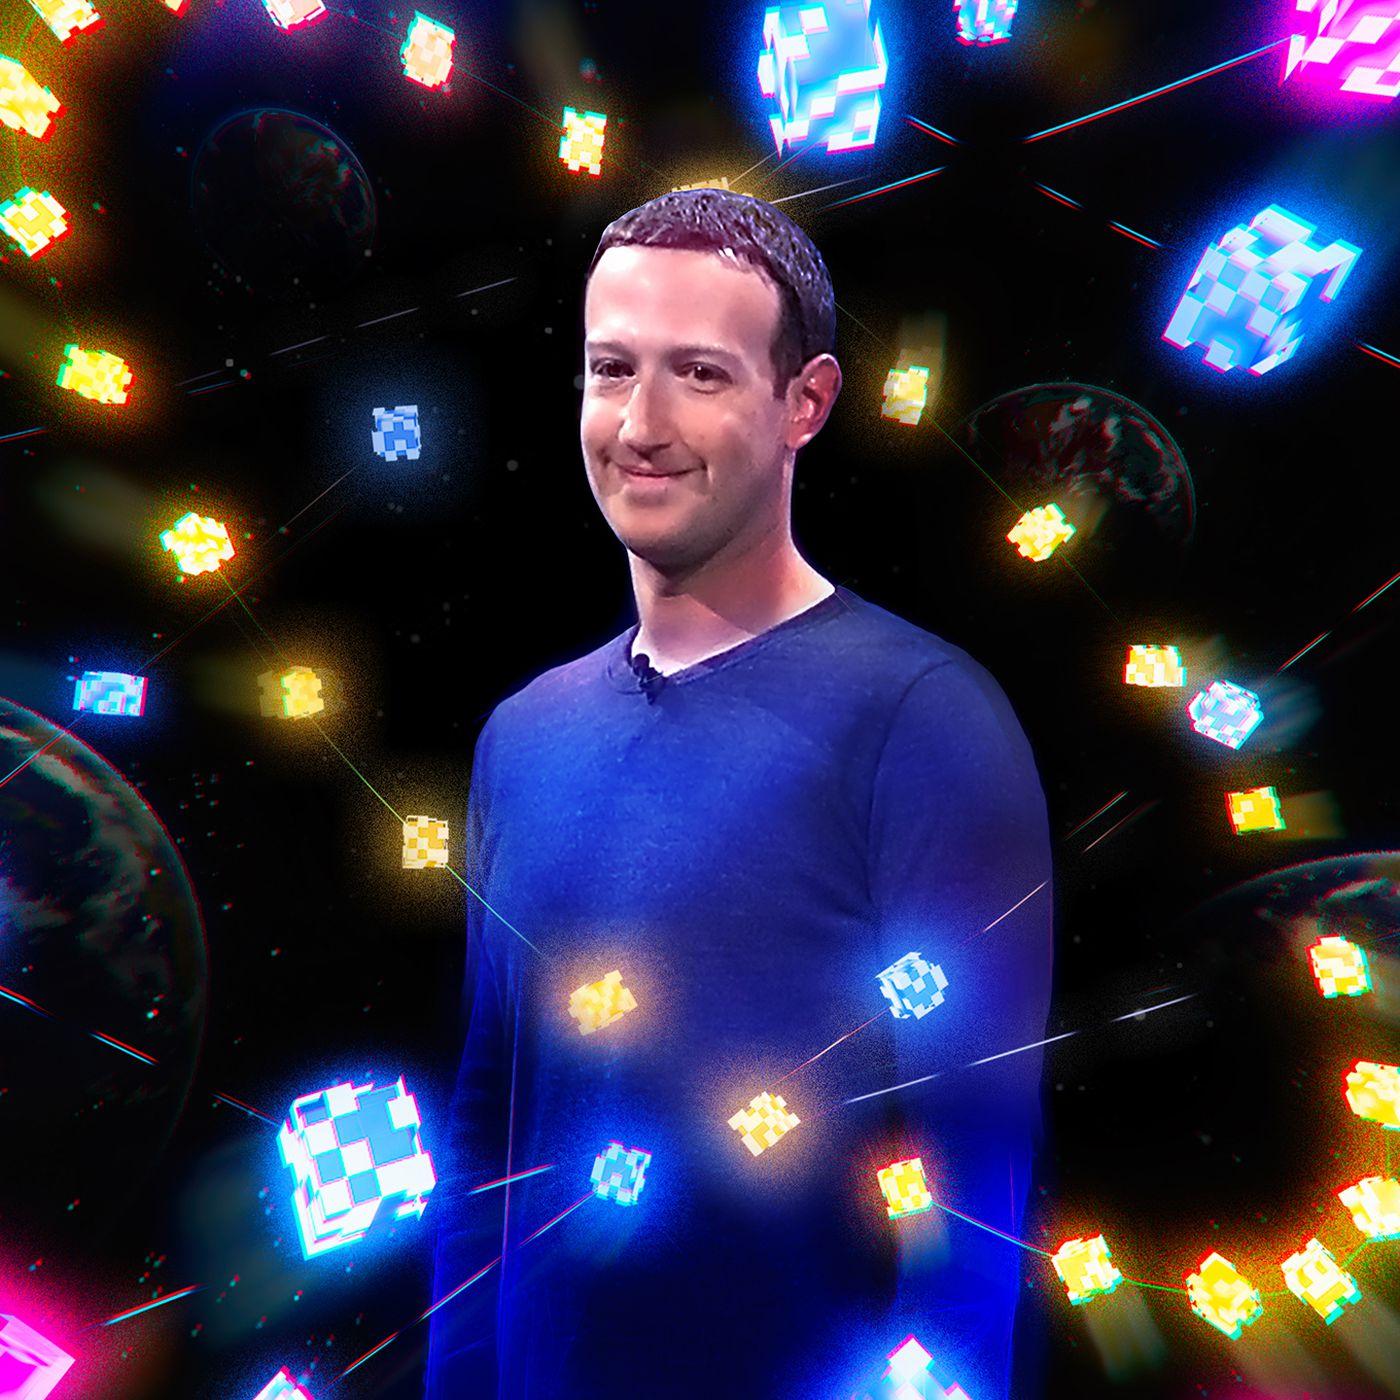 Mark Zuckerberg is betting Facebook's future on the metaverse - The Verge